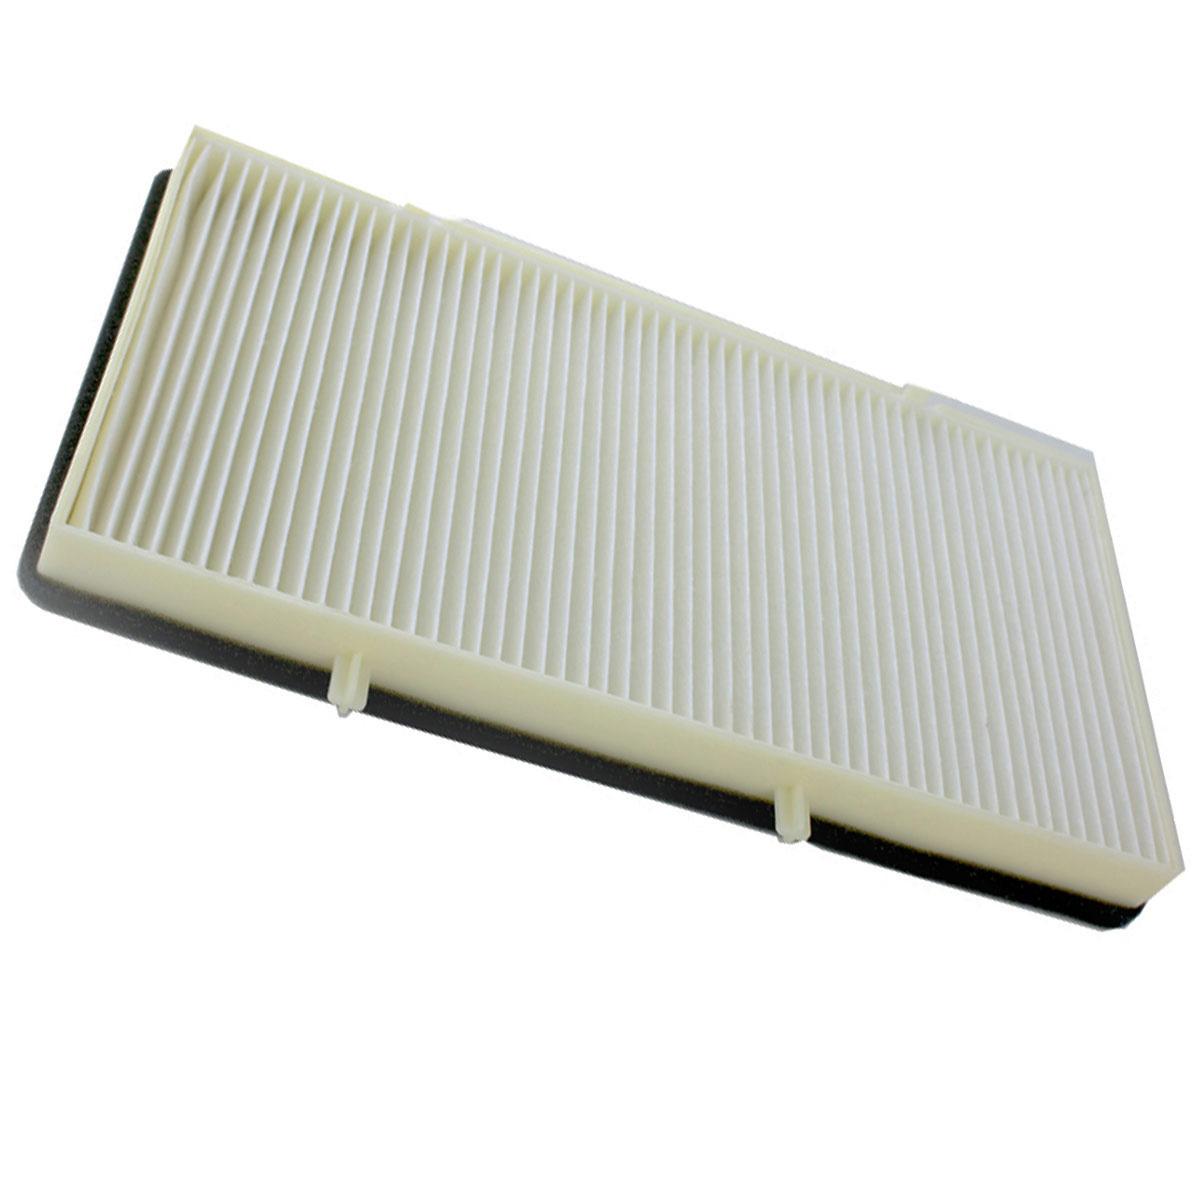 Innenraumfilter für Nissan, Opel Vivaro, Renault Trafic, entsp. CU3454, FK00053